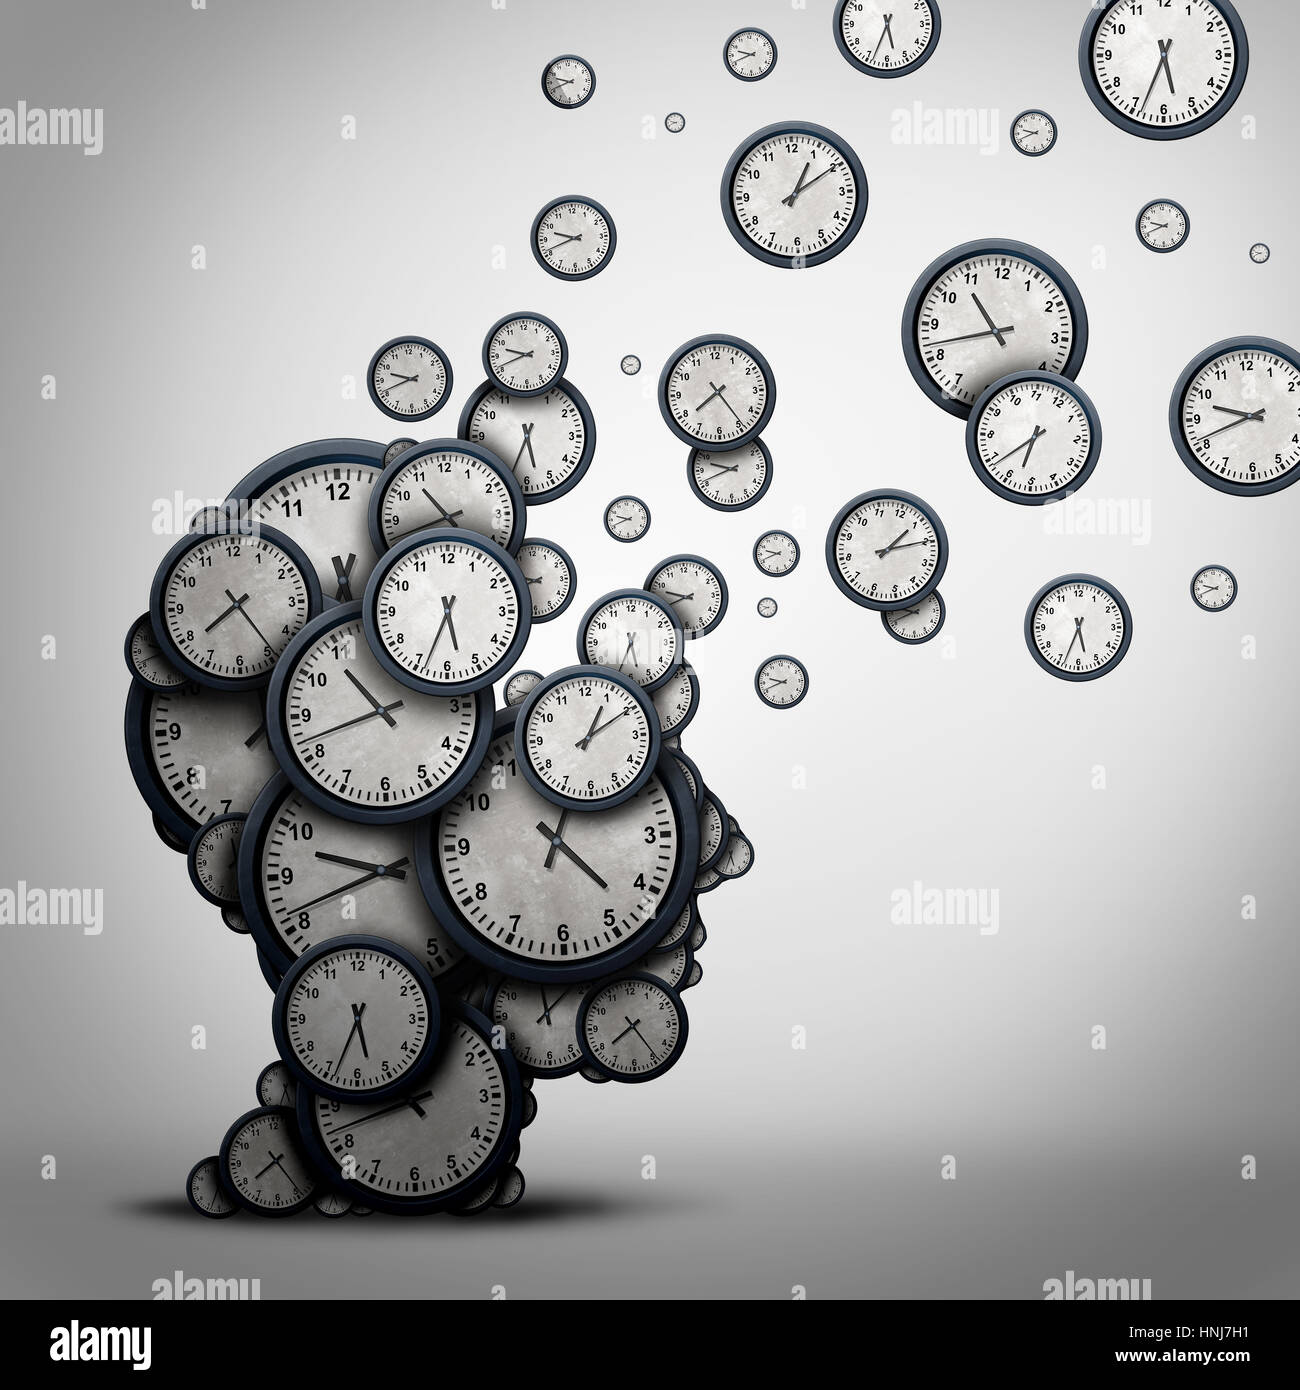 Concepto de negocio de tiempo de planificación o emaciación minutos como un grupo de relojes o relojes Imagen De Stock